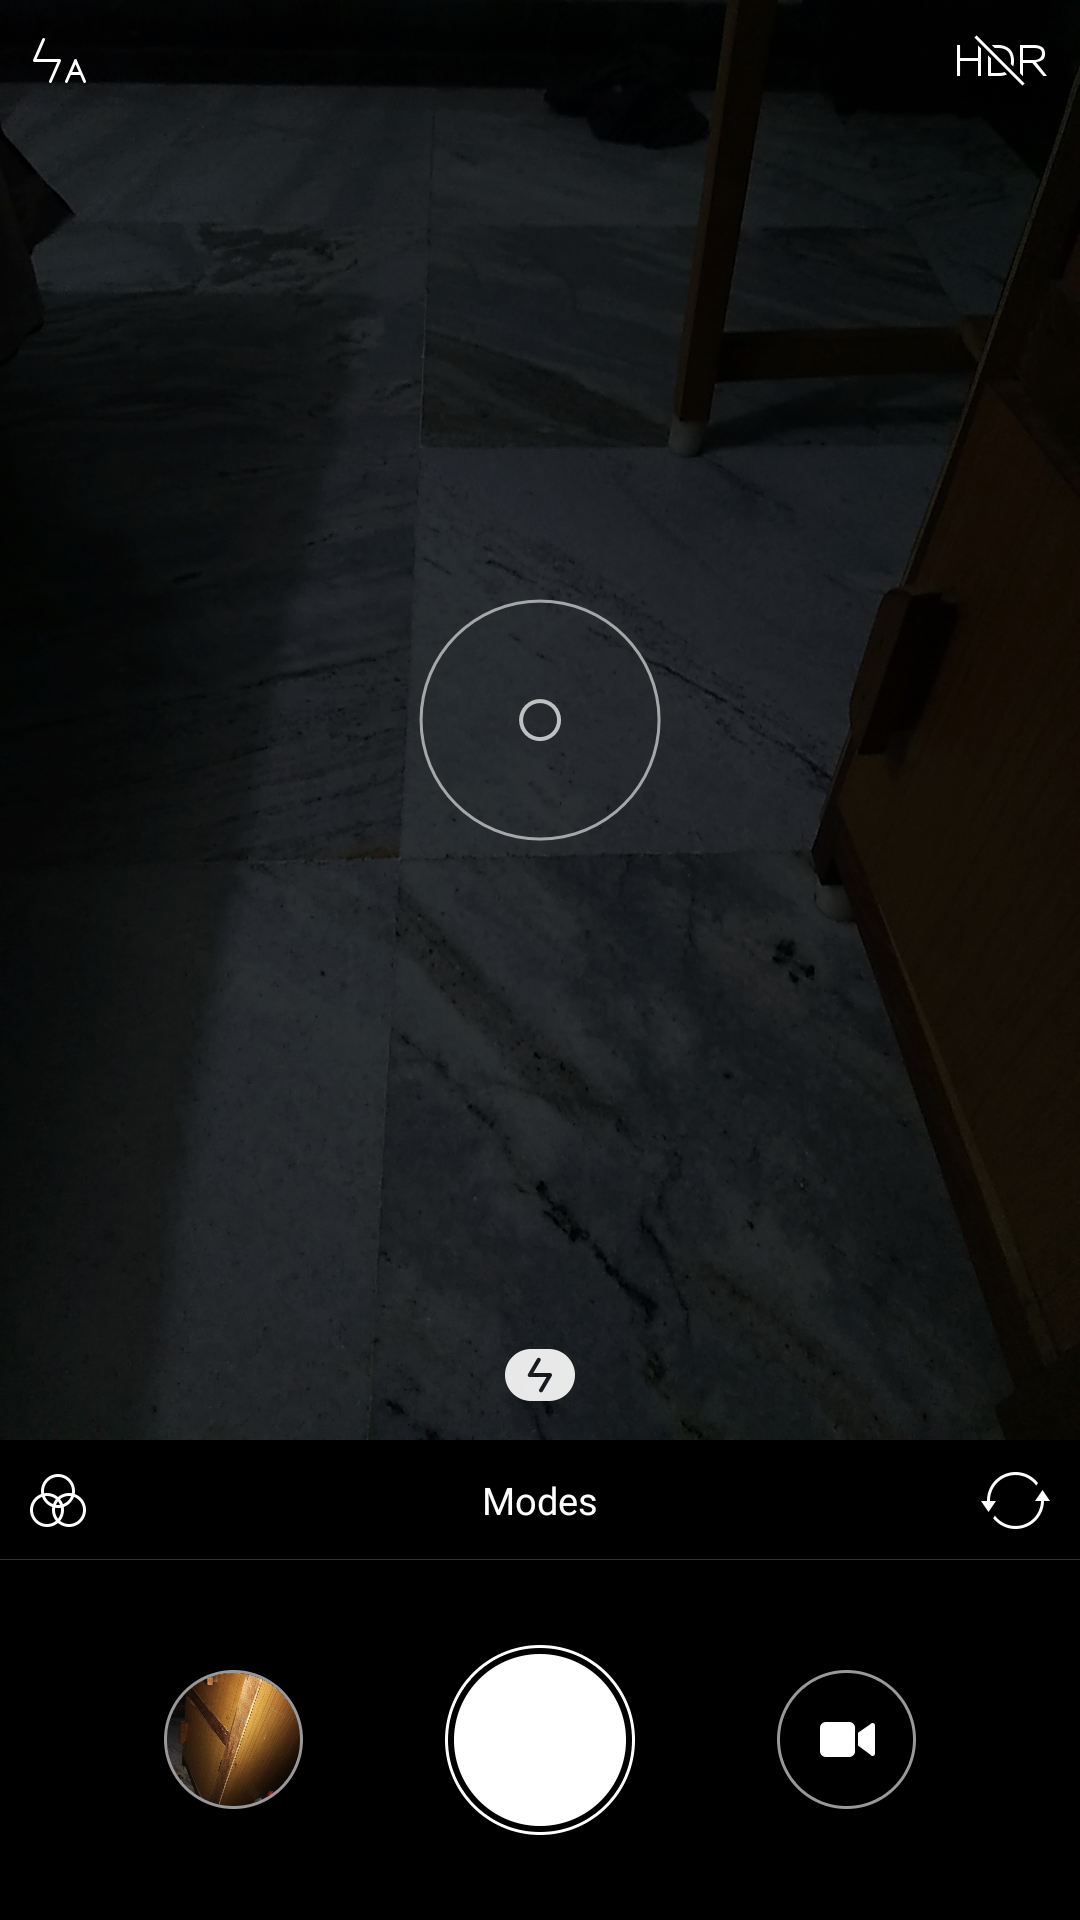 miui 8 camera এর চিত্র ফলাফল